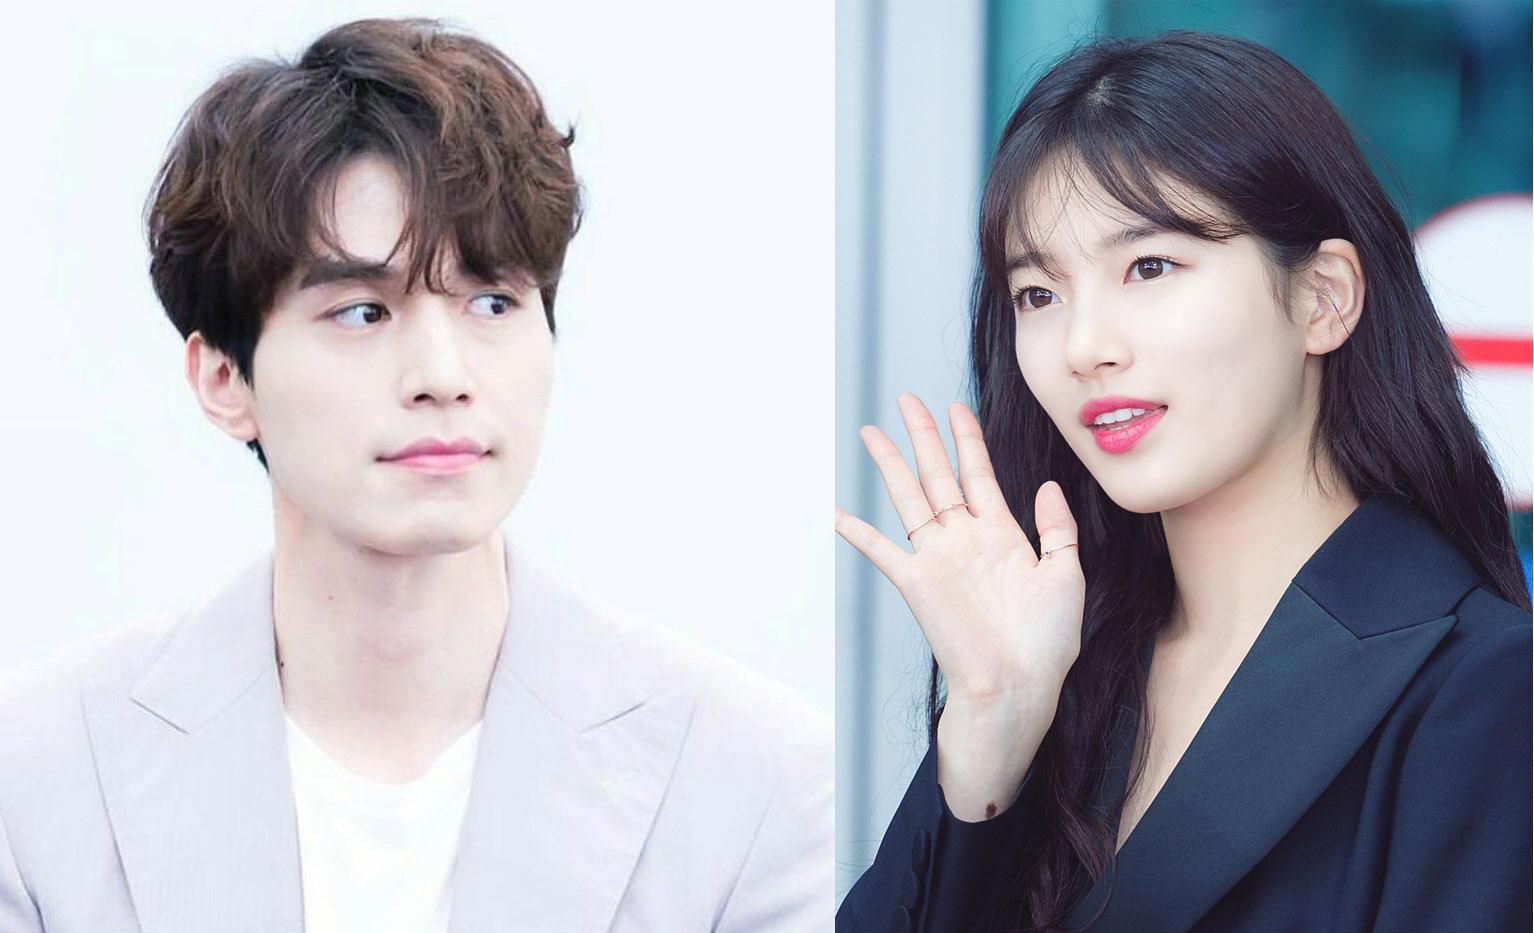 Exo dating scandalo 2016